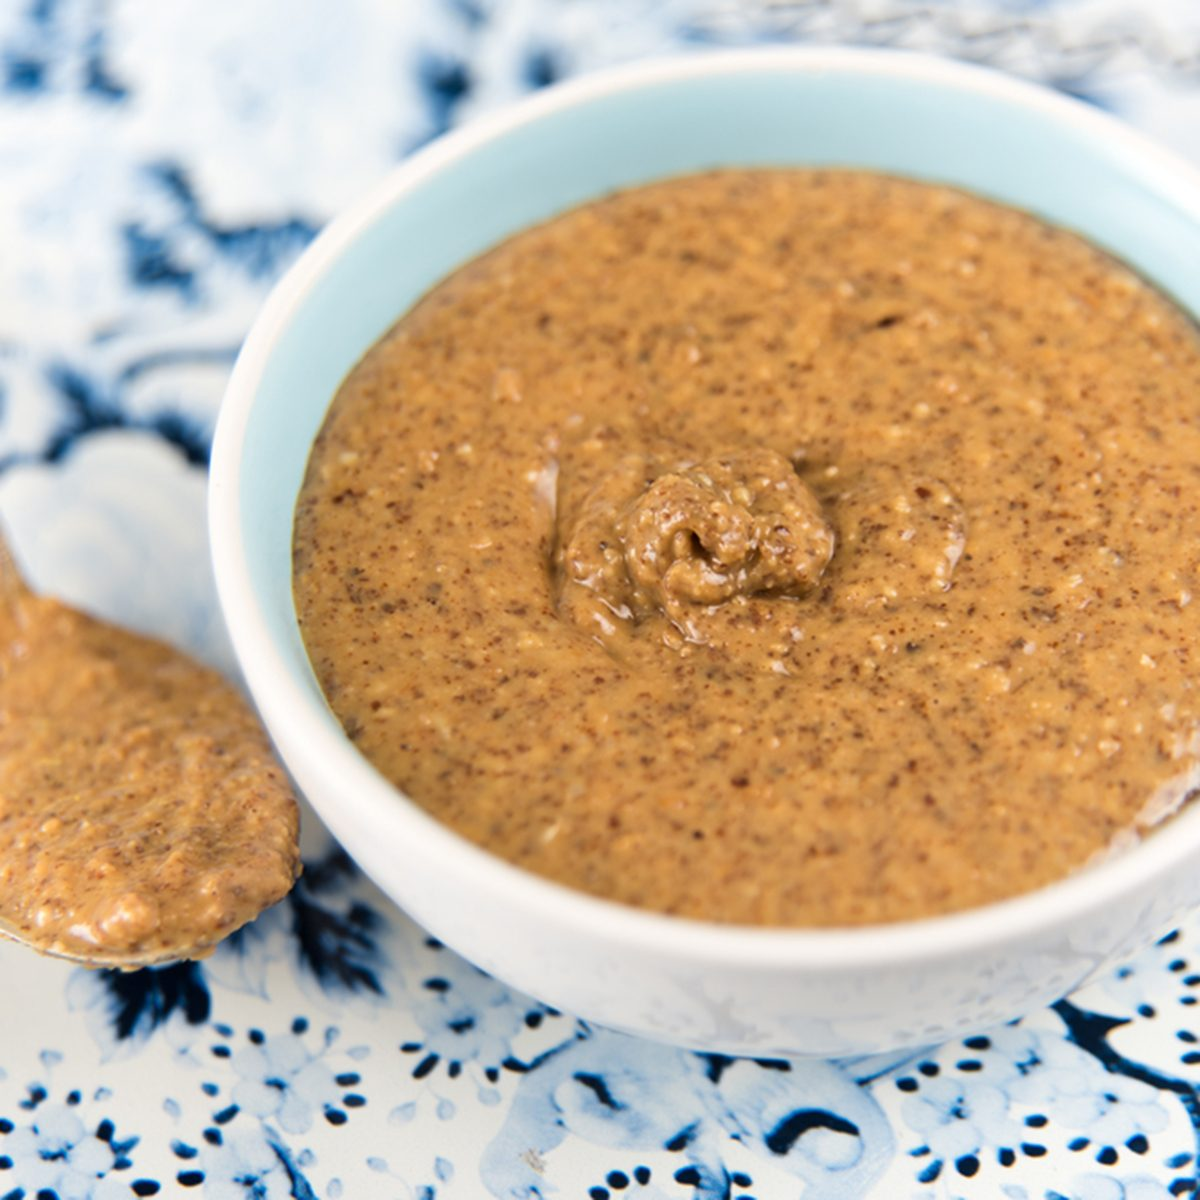 Organic Freshly Made Almond Butter in Small Serving Bowl; Shutterstock ID 278857178; Job (TFH, TOH, RD, BNB, CWM, CM): TOH